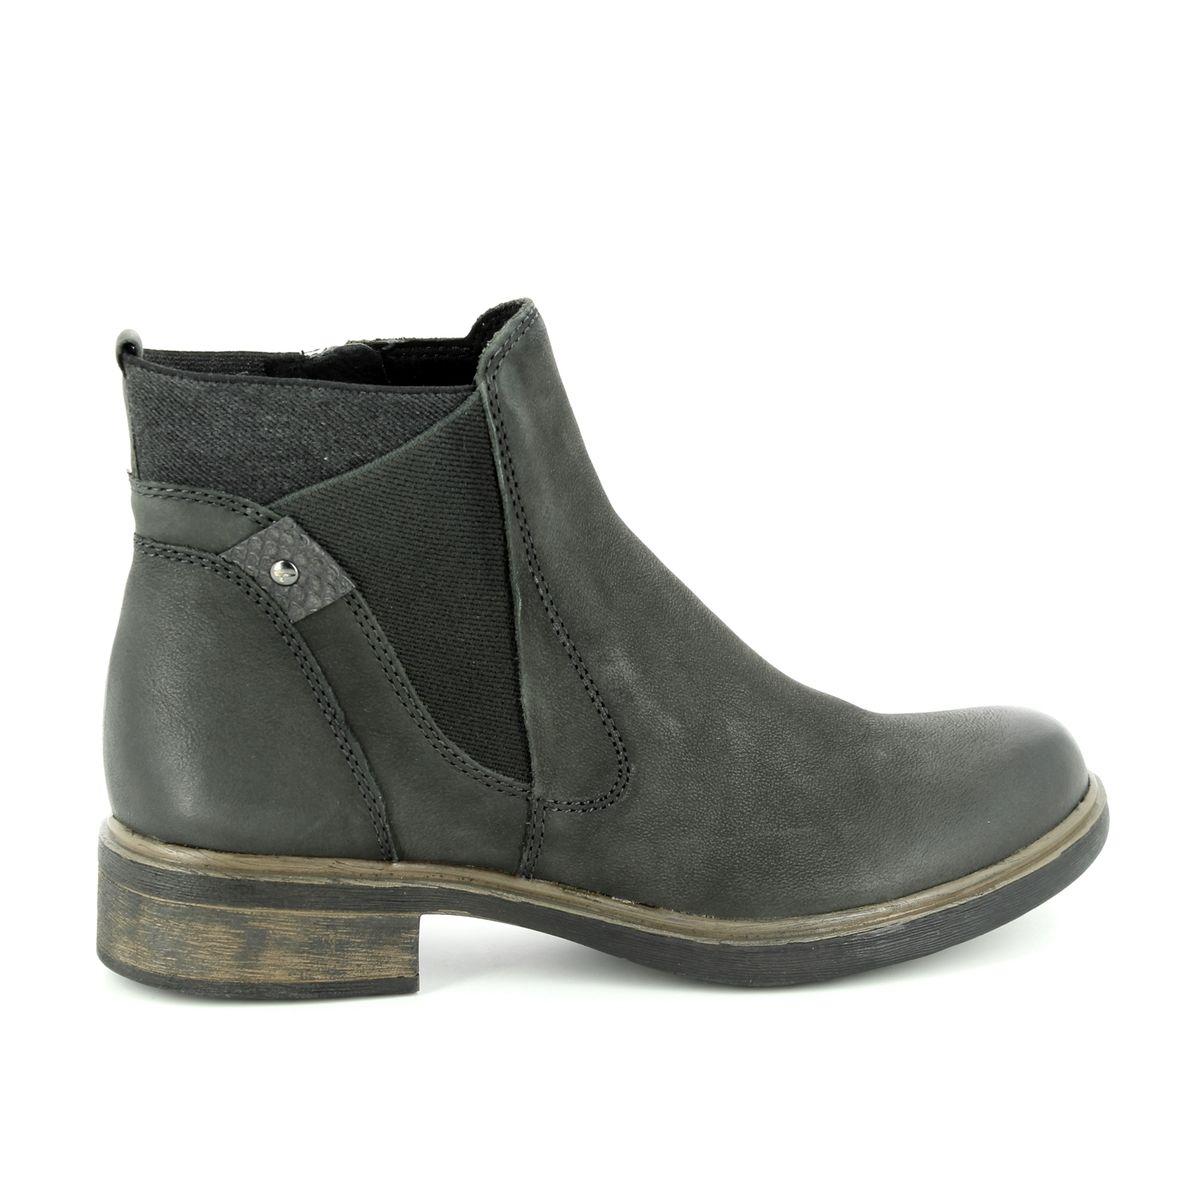 2c4d3ac35a8554 Tamaris Chelsea Boots - Khaki Leather - 25317 21 712 HELIOBAND 85